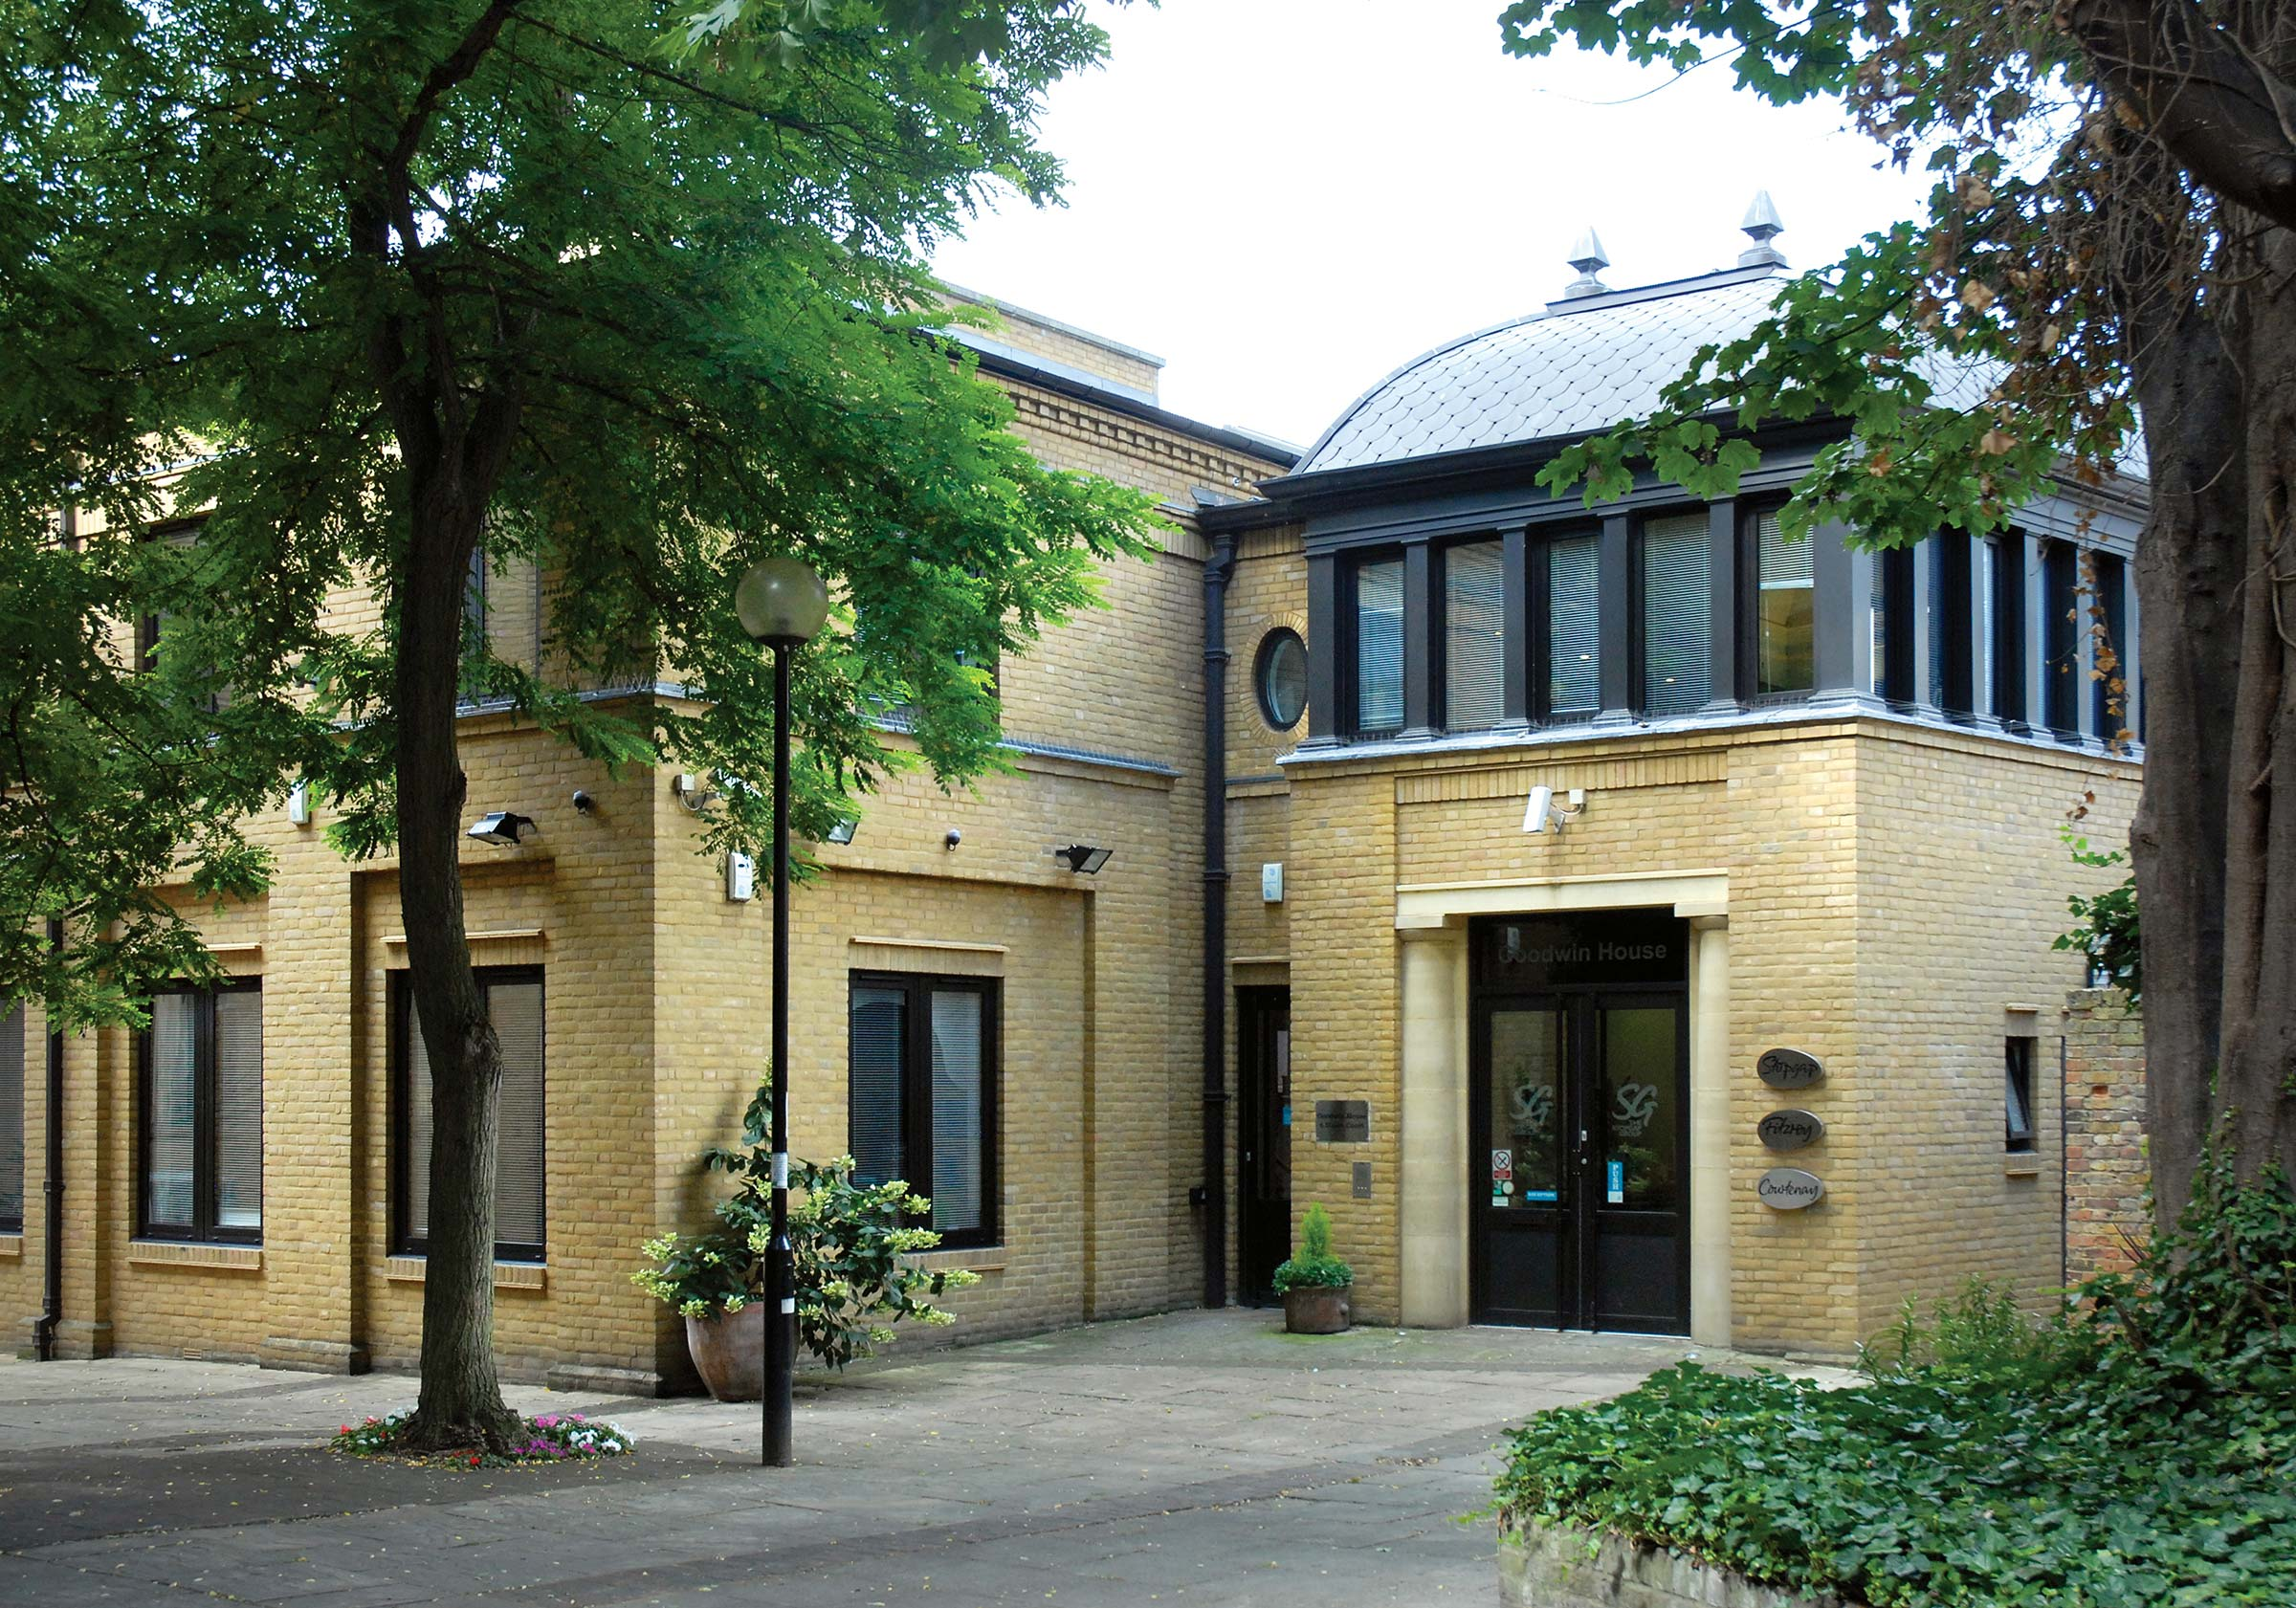 Union Court and Eton Street, Richmond, Surrey